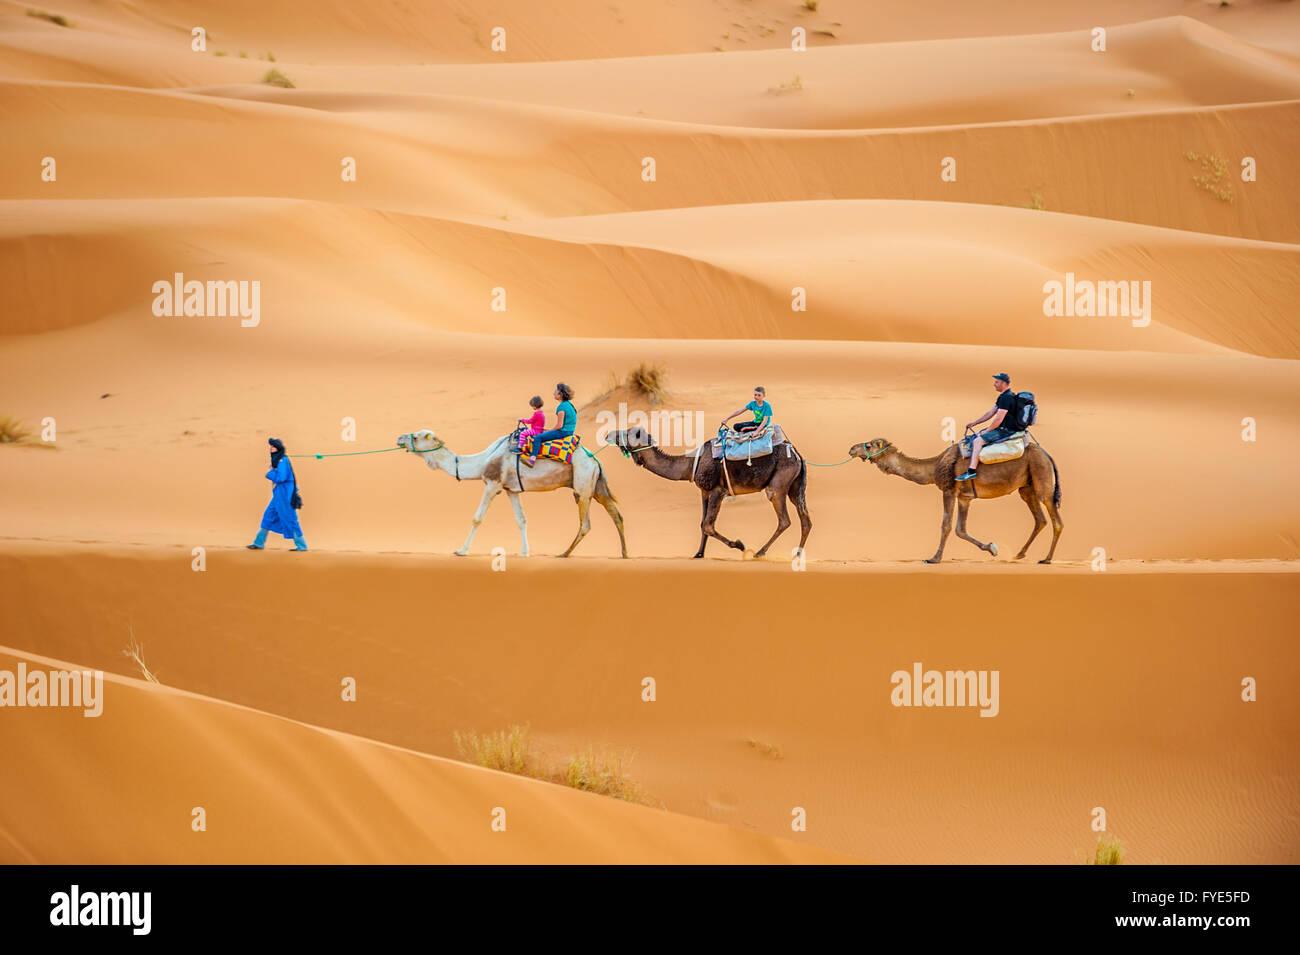 ERG CHEBBY, Marokko - 12. April 2013: Touristen Kamelreiten in Erg Chebbi, Marokko Stockbild